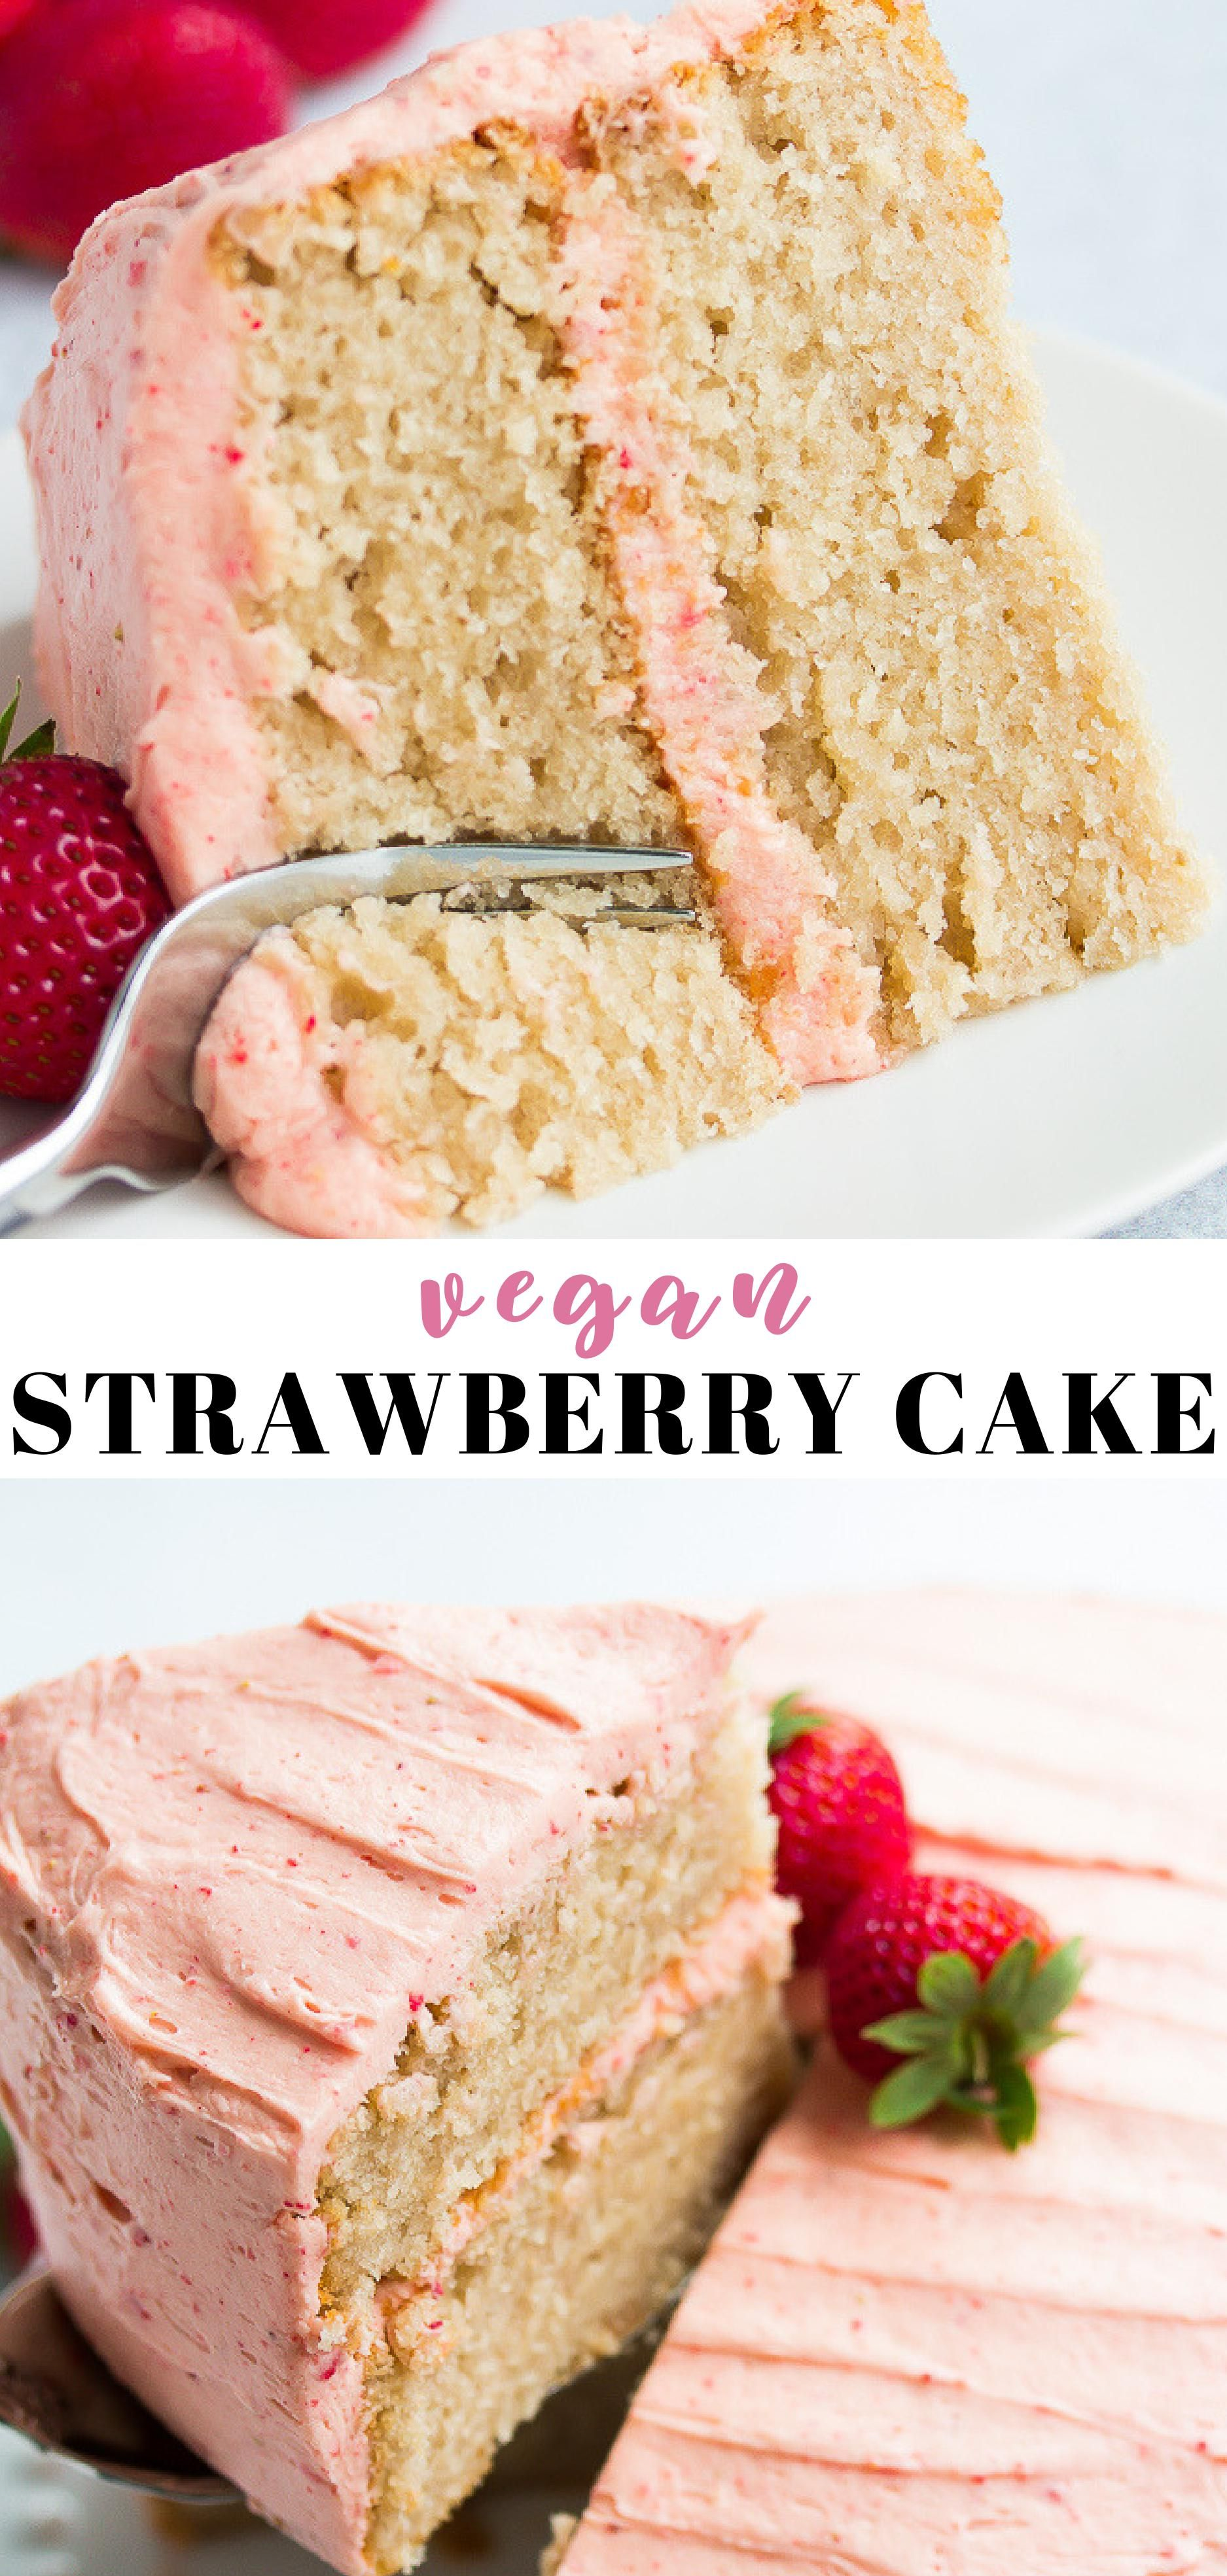 Photo of Vegan Strawberry Cake